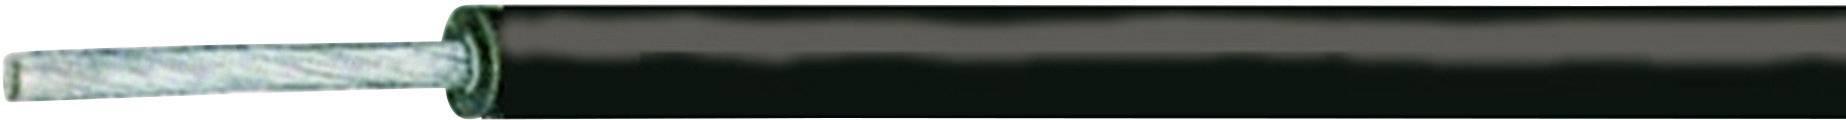 Stikalna žica SiL-SiAF 1 x 2.50 mm, rdeča XBK Kabel cena za meter